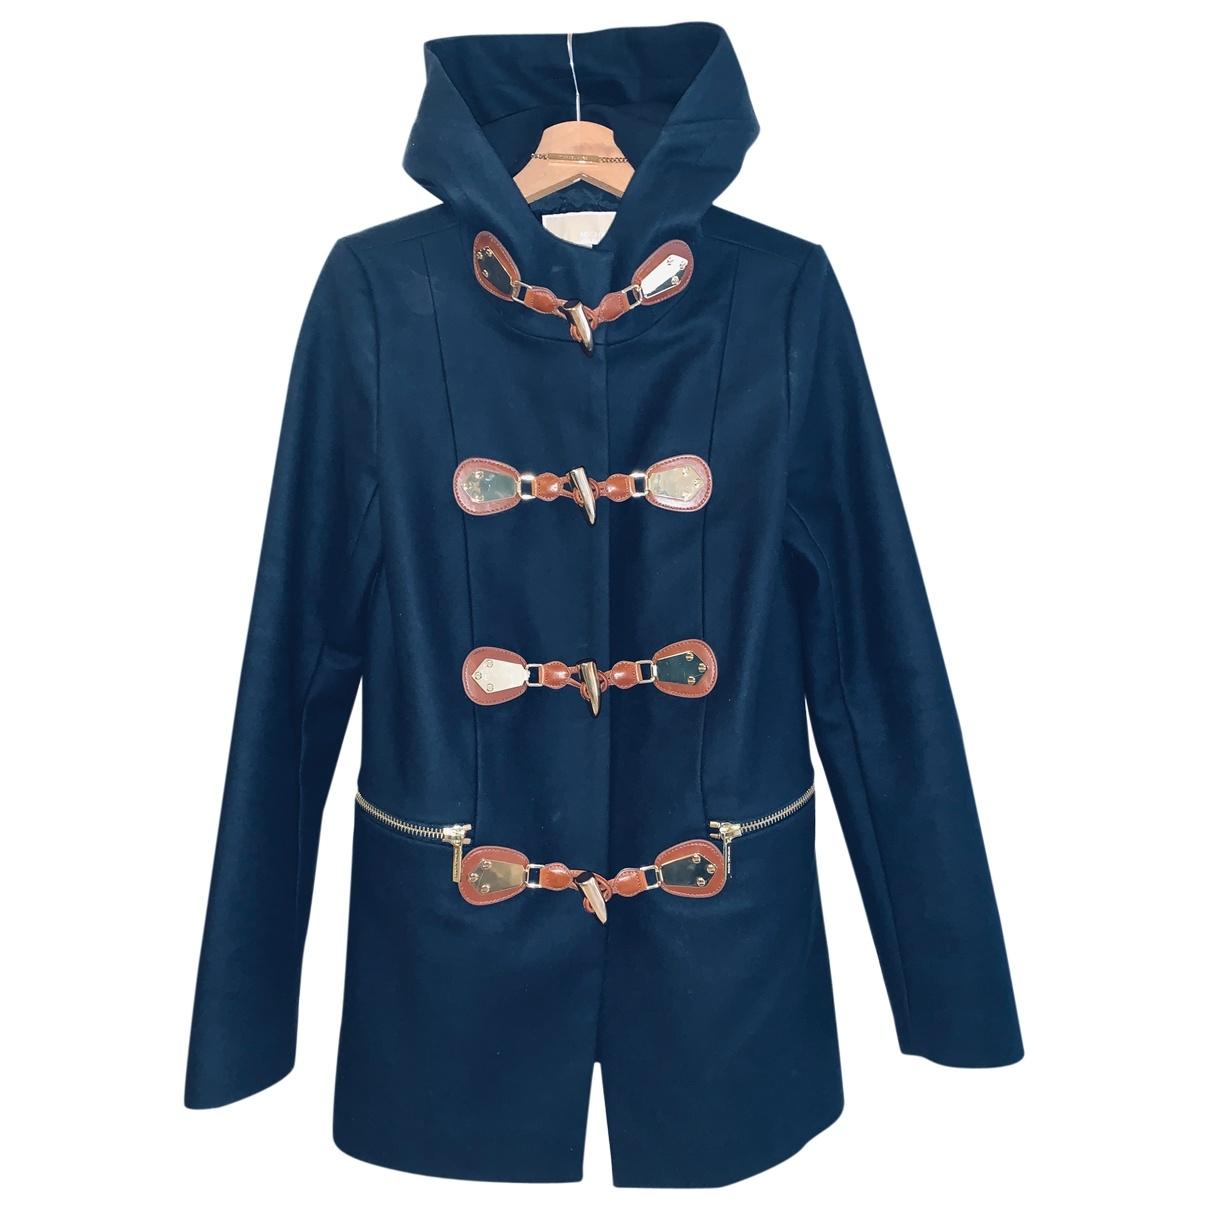 Michael Kors \N Navy Wool coat for Women S International